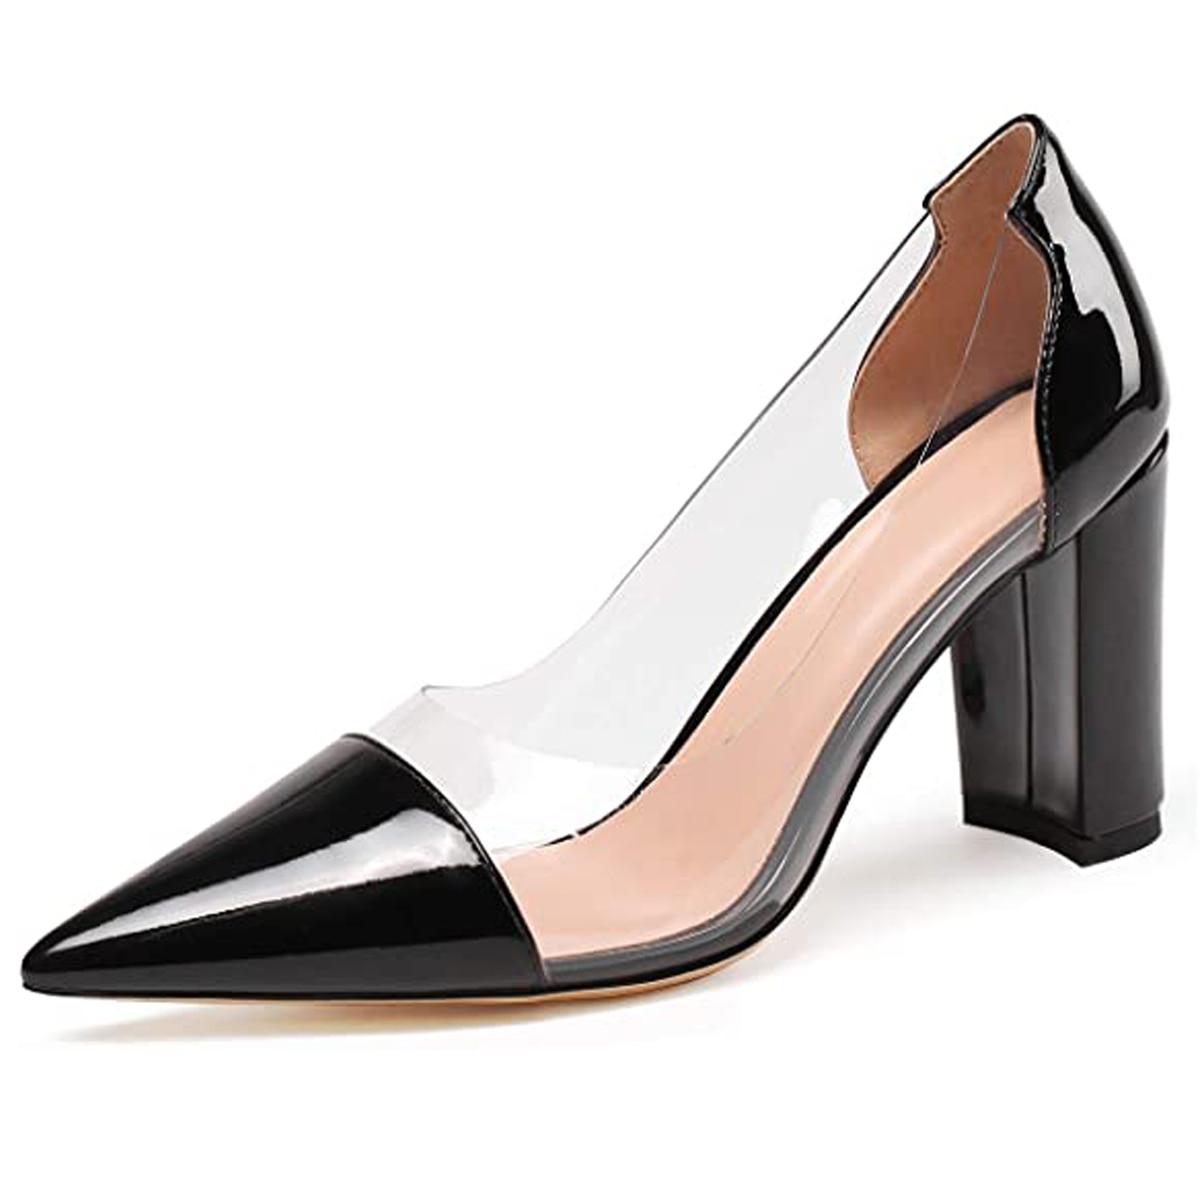 LOVIRS-حذاء سهرة نسائي بكعب عالٍ ومقدمة مدببة ، حذاء بدون أربطة ، كعب سميك 10 سنتيمتر ، US 5-15